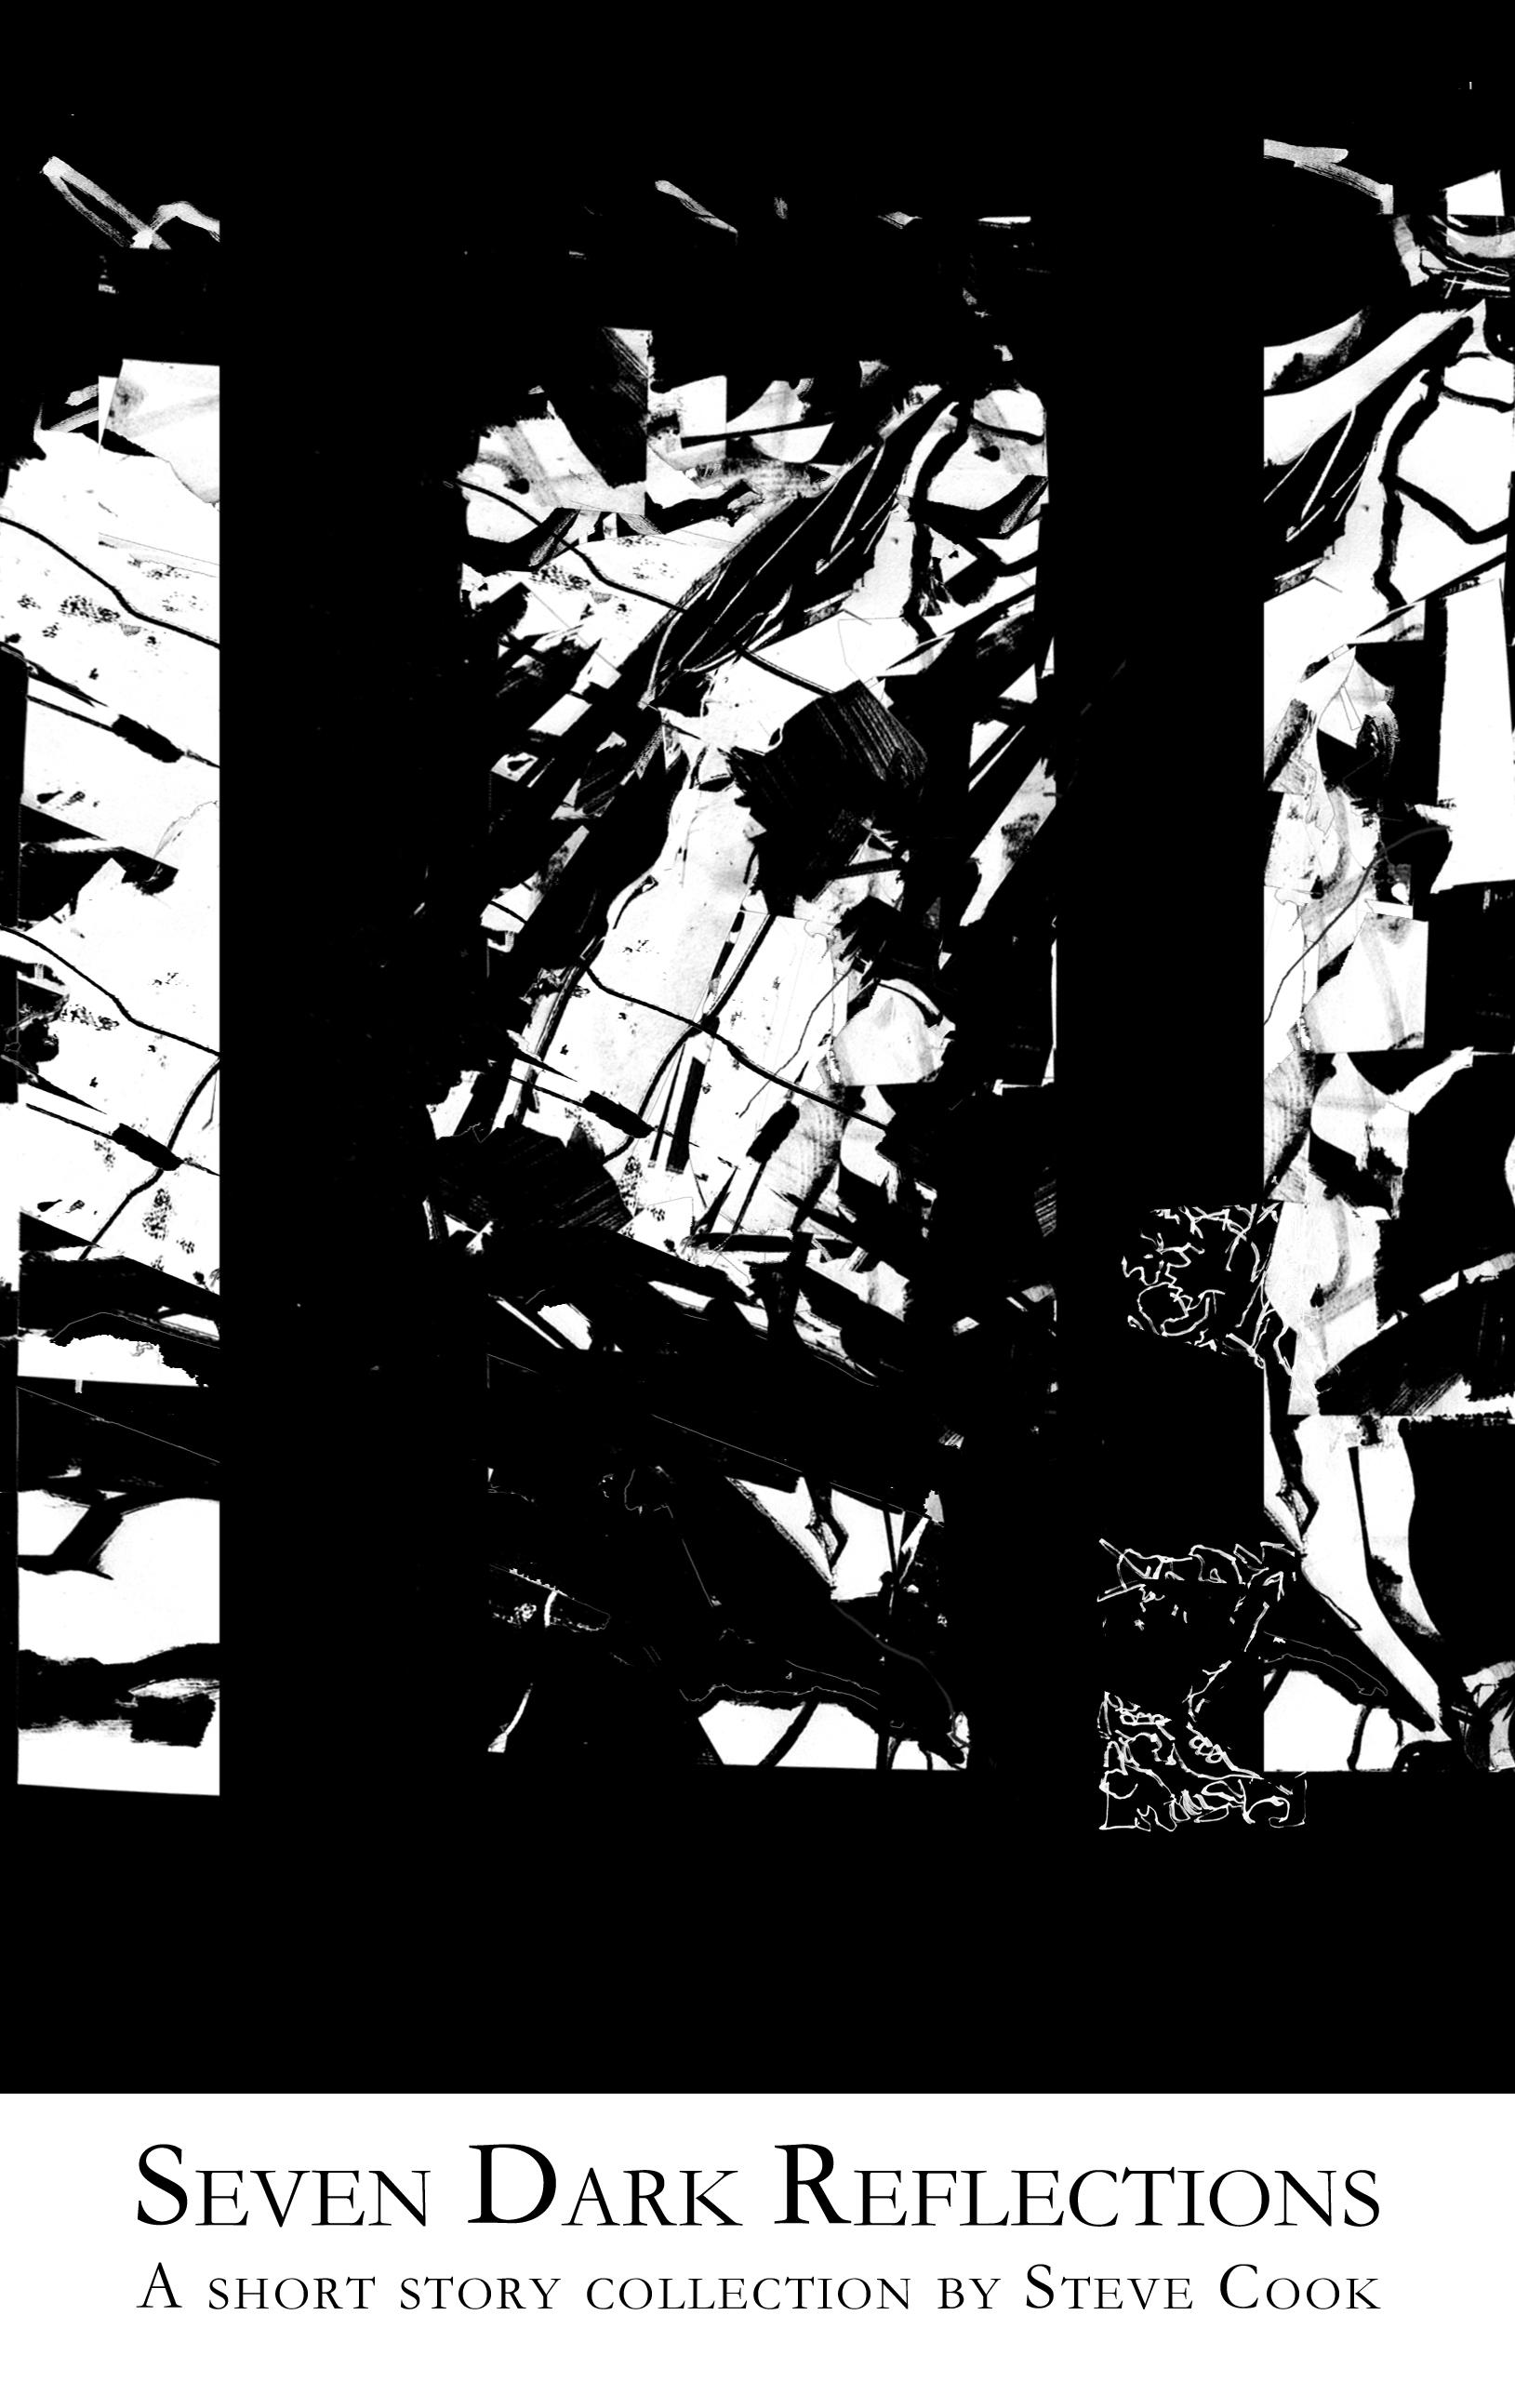 Seven_Dark_Reflections_Final.jpg